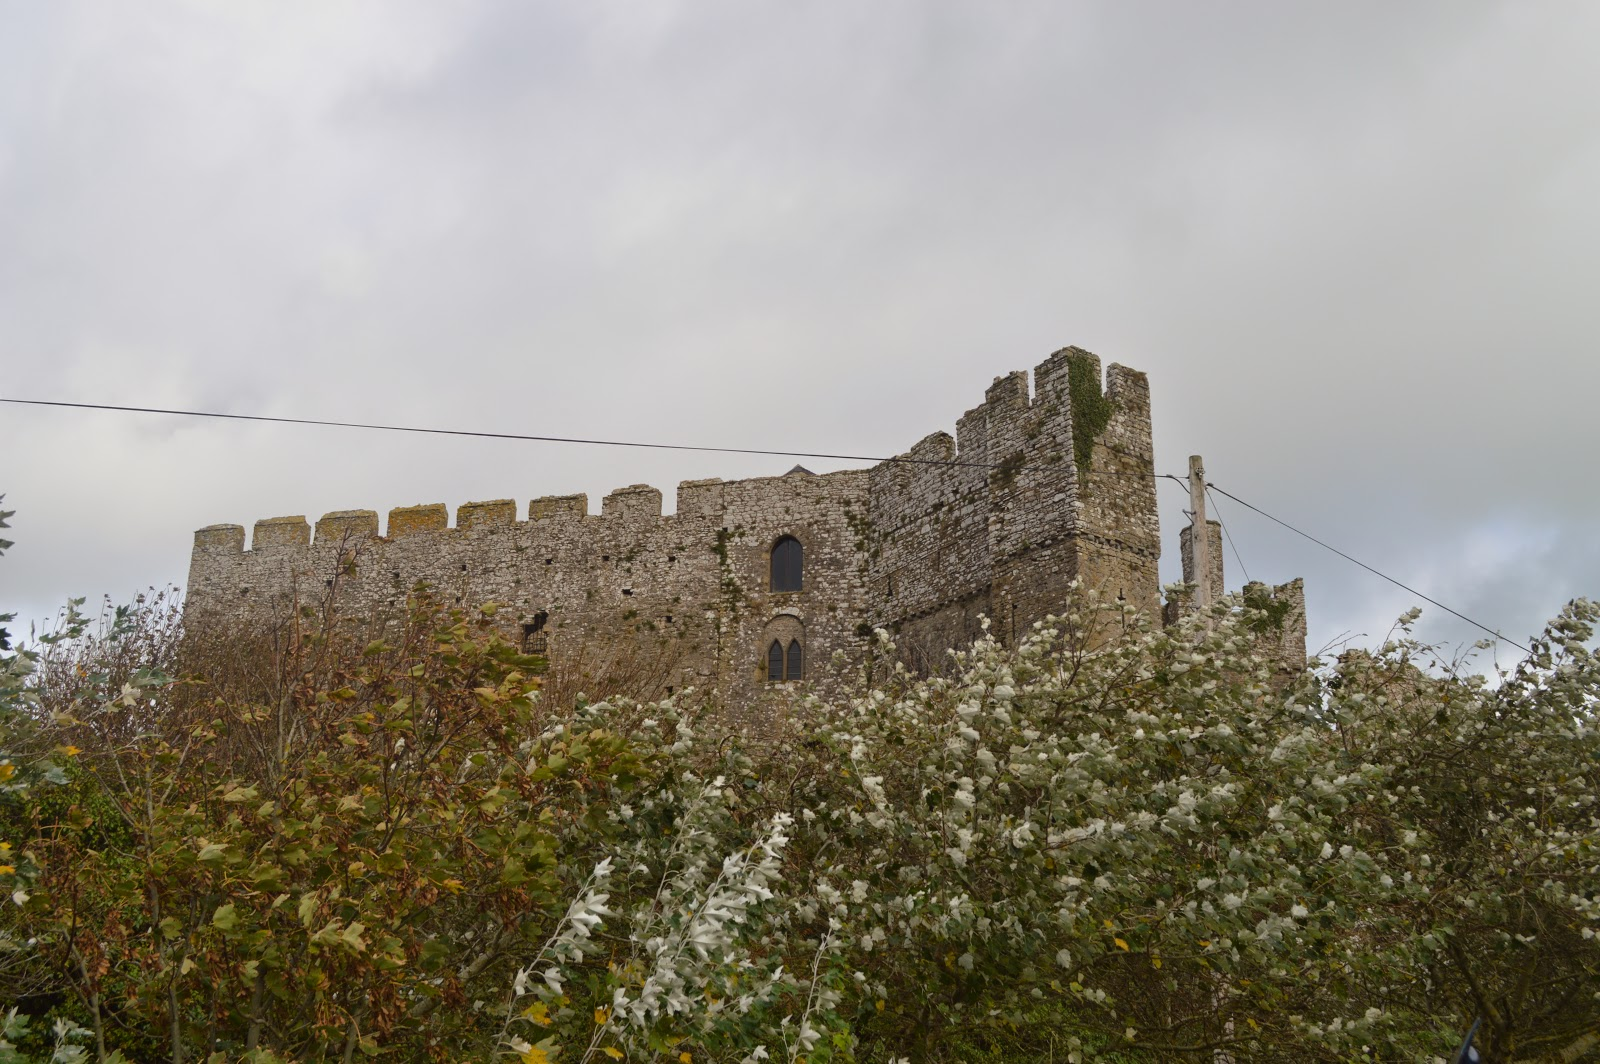 Manorbier Castle, Pembrokeshire, Wales